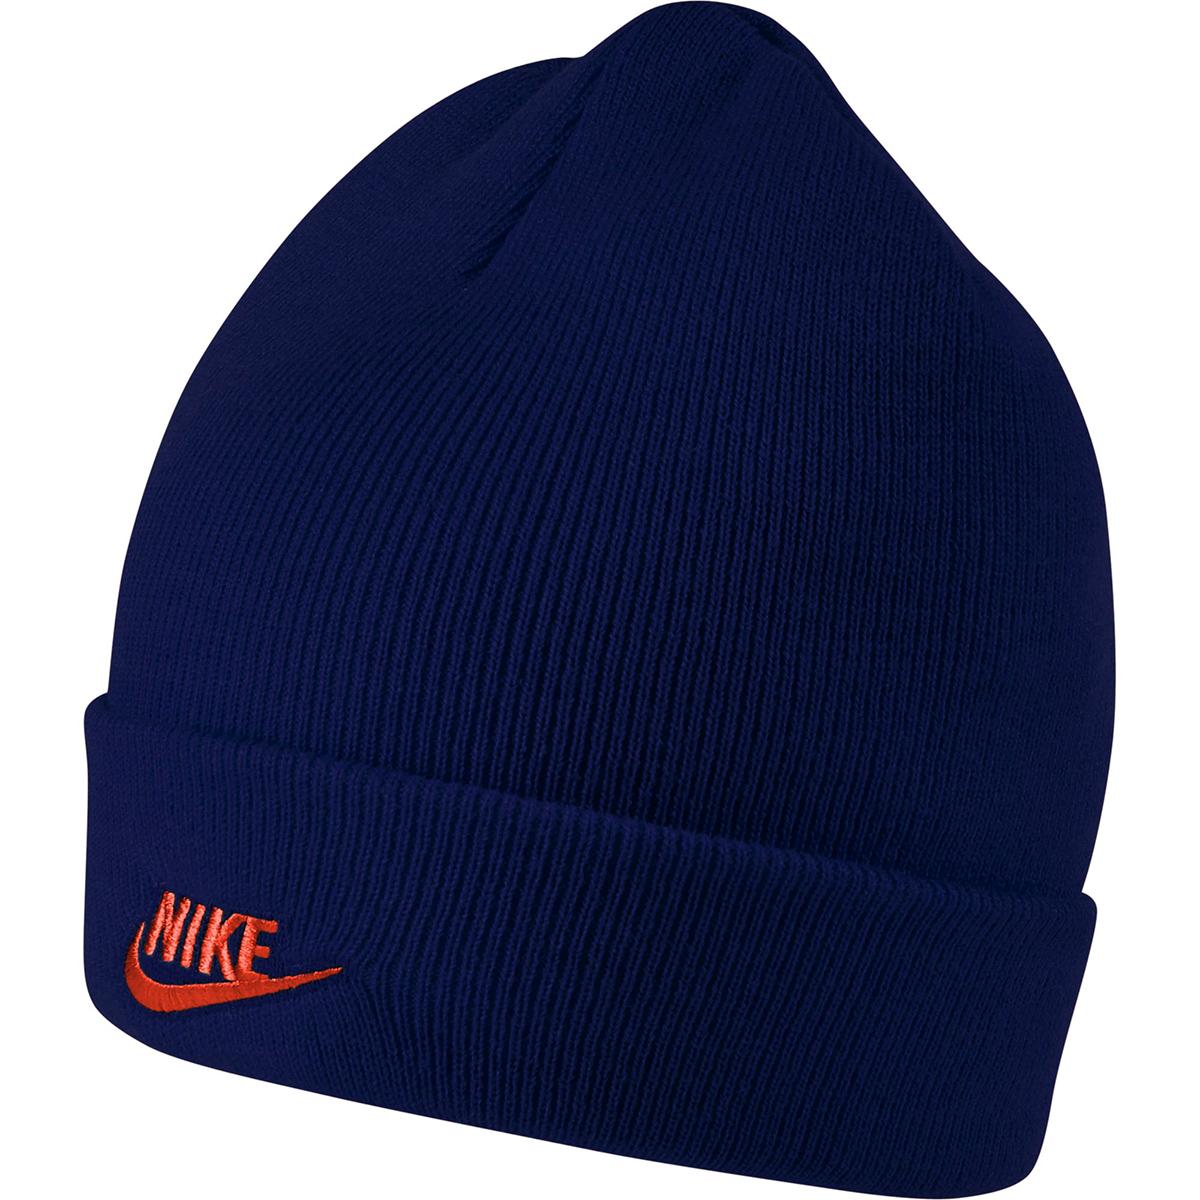 Nike Men's Cuff Swoosh Beanie